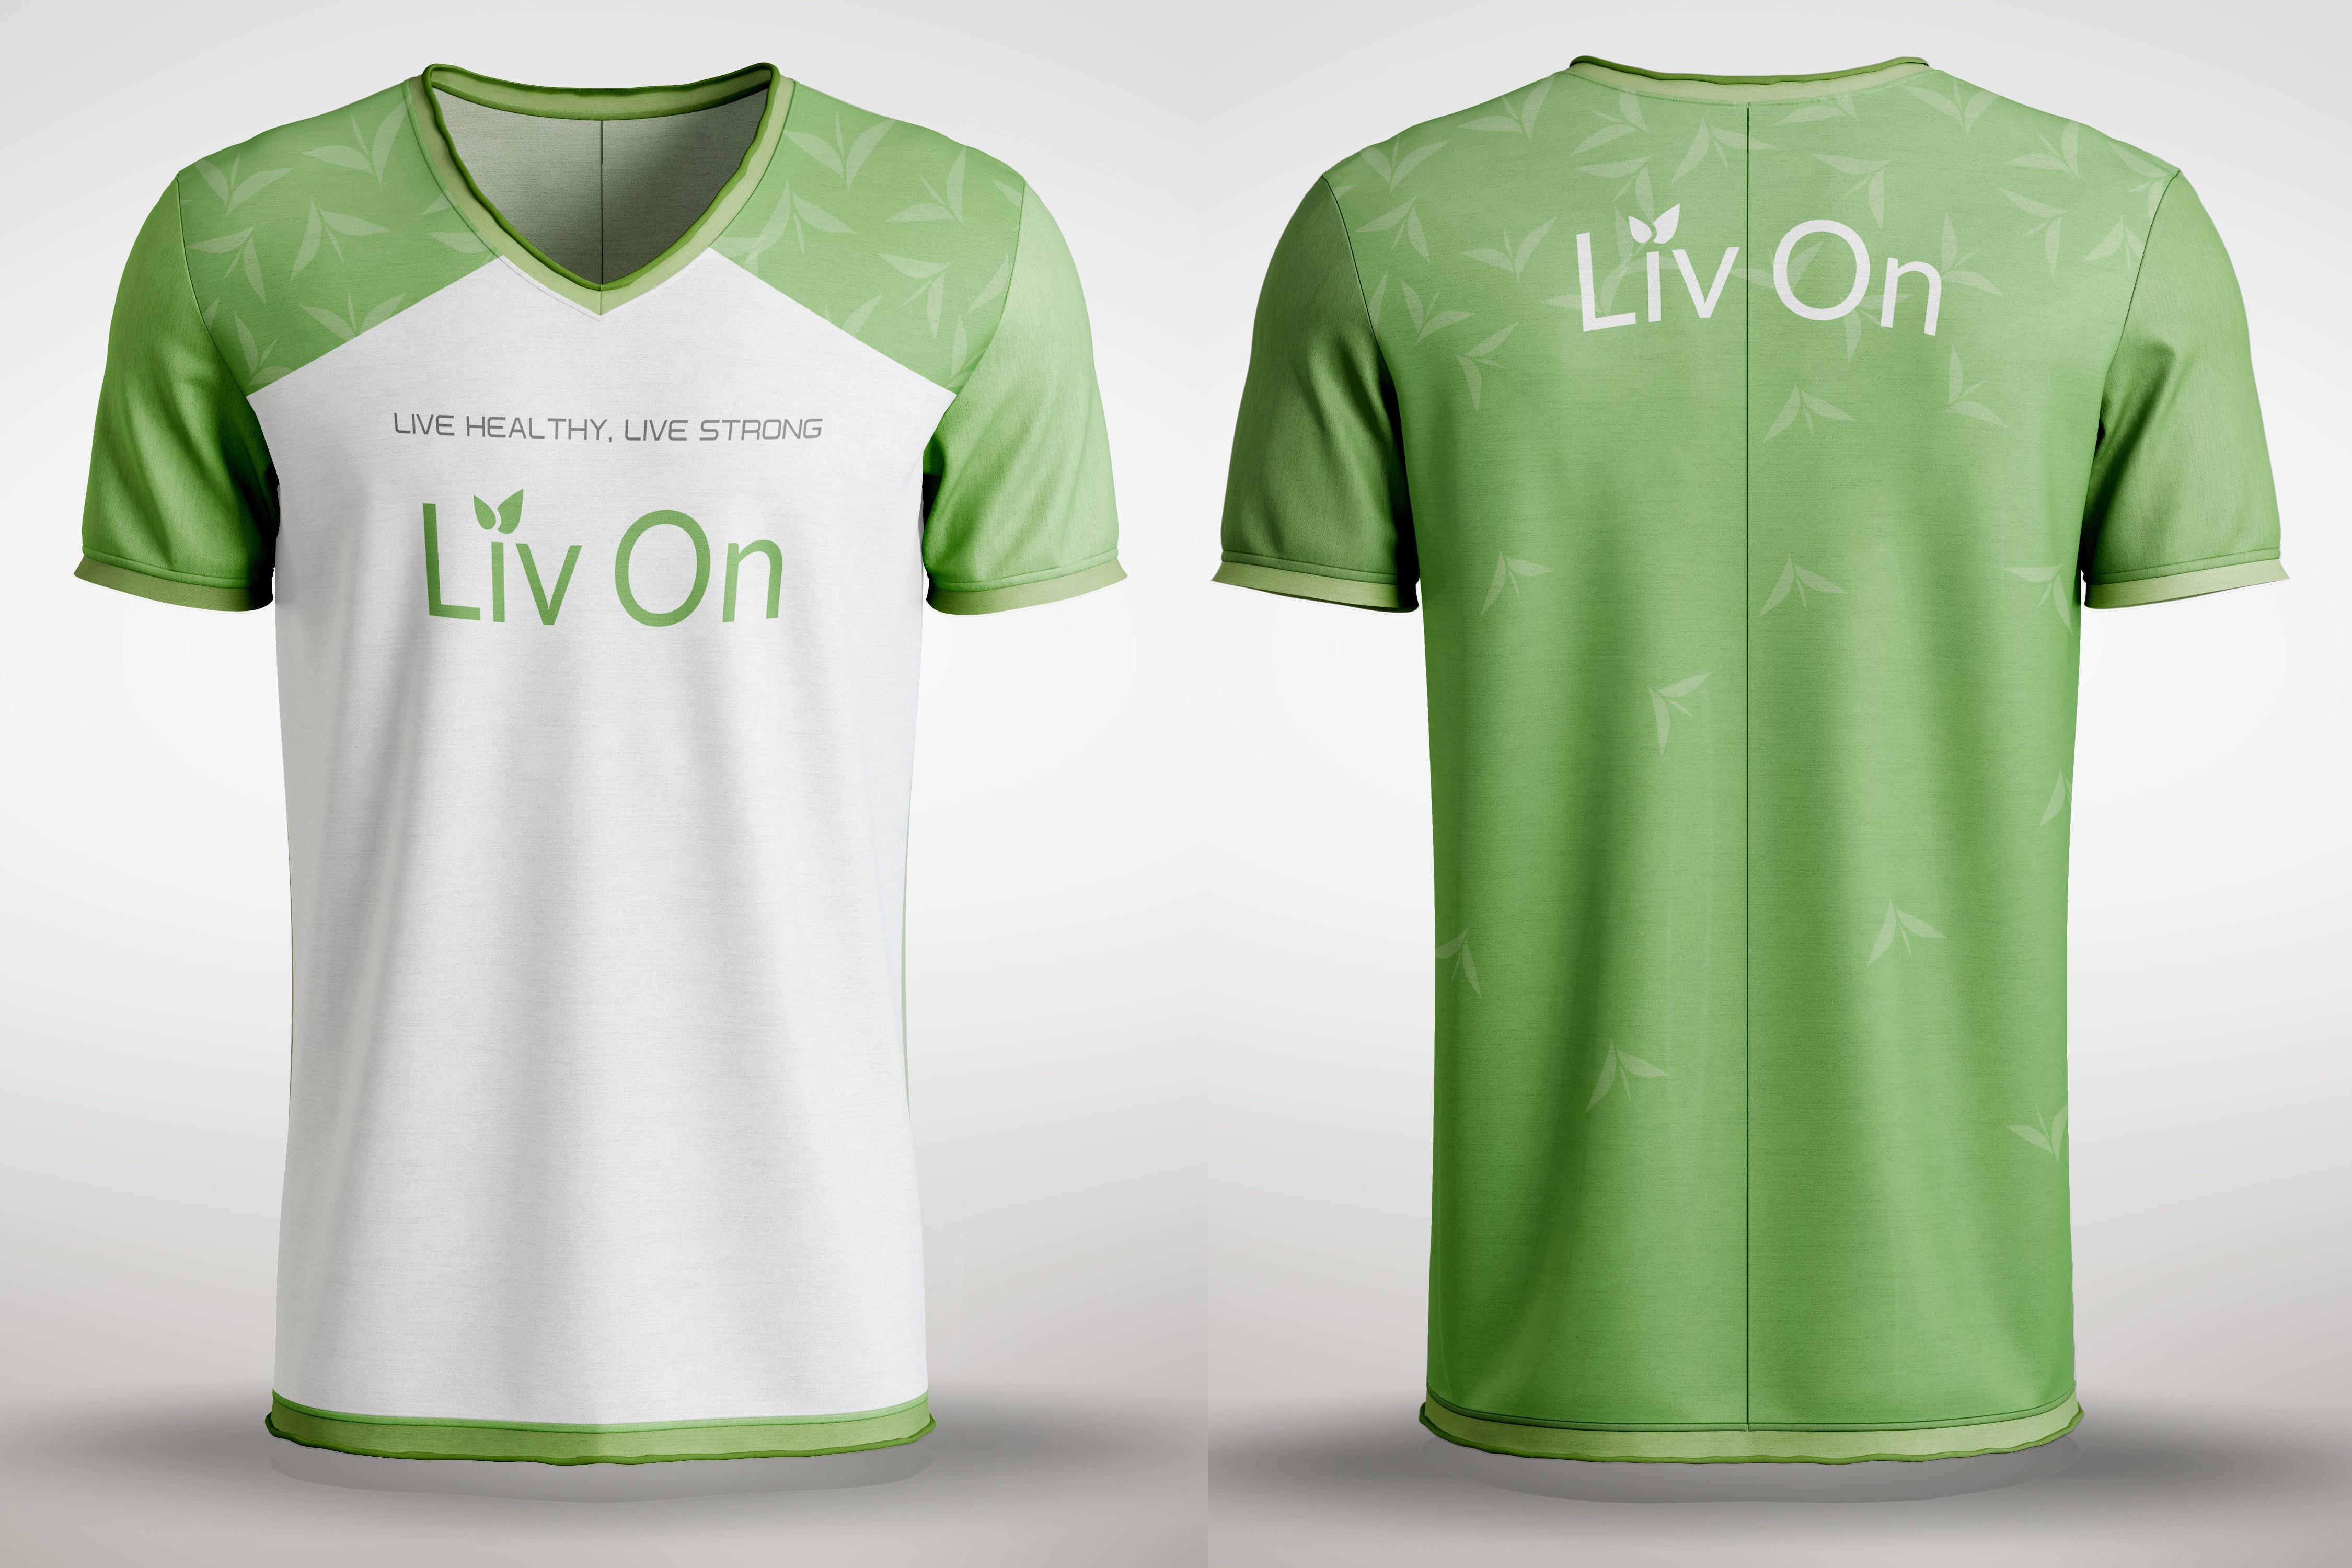 Liv On Fitness Expo T-Shirt Design